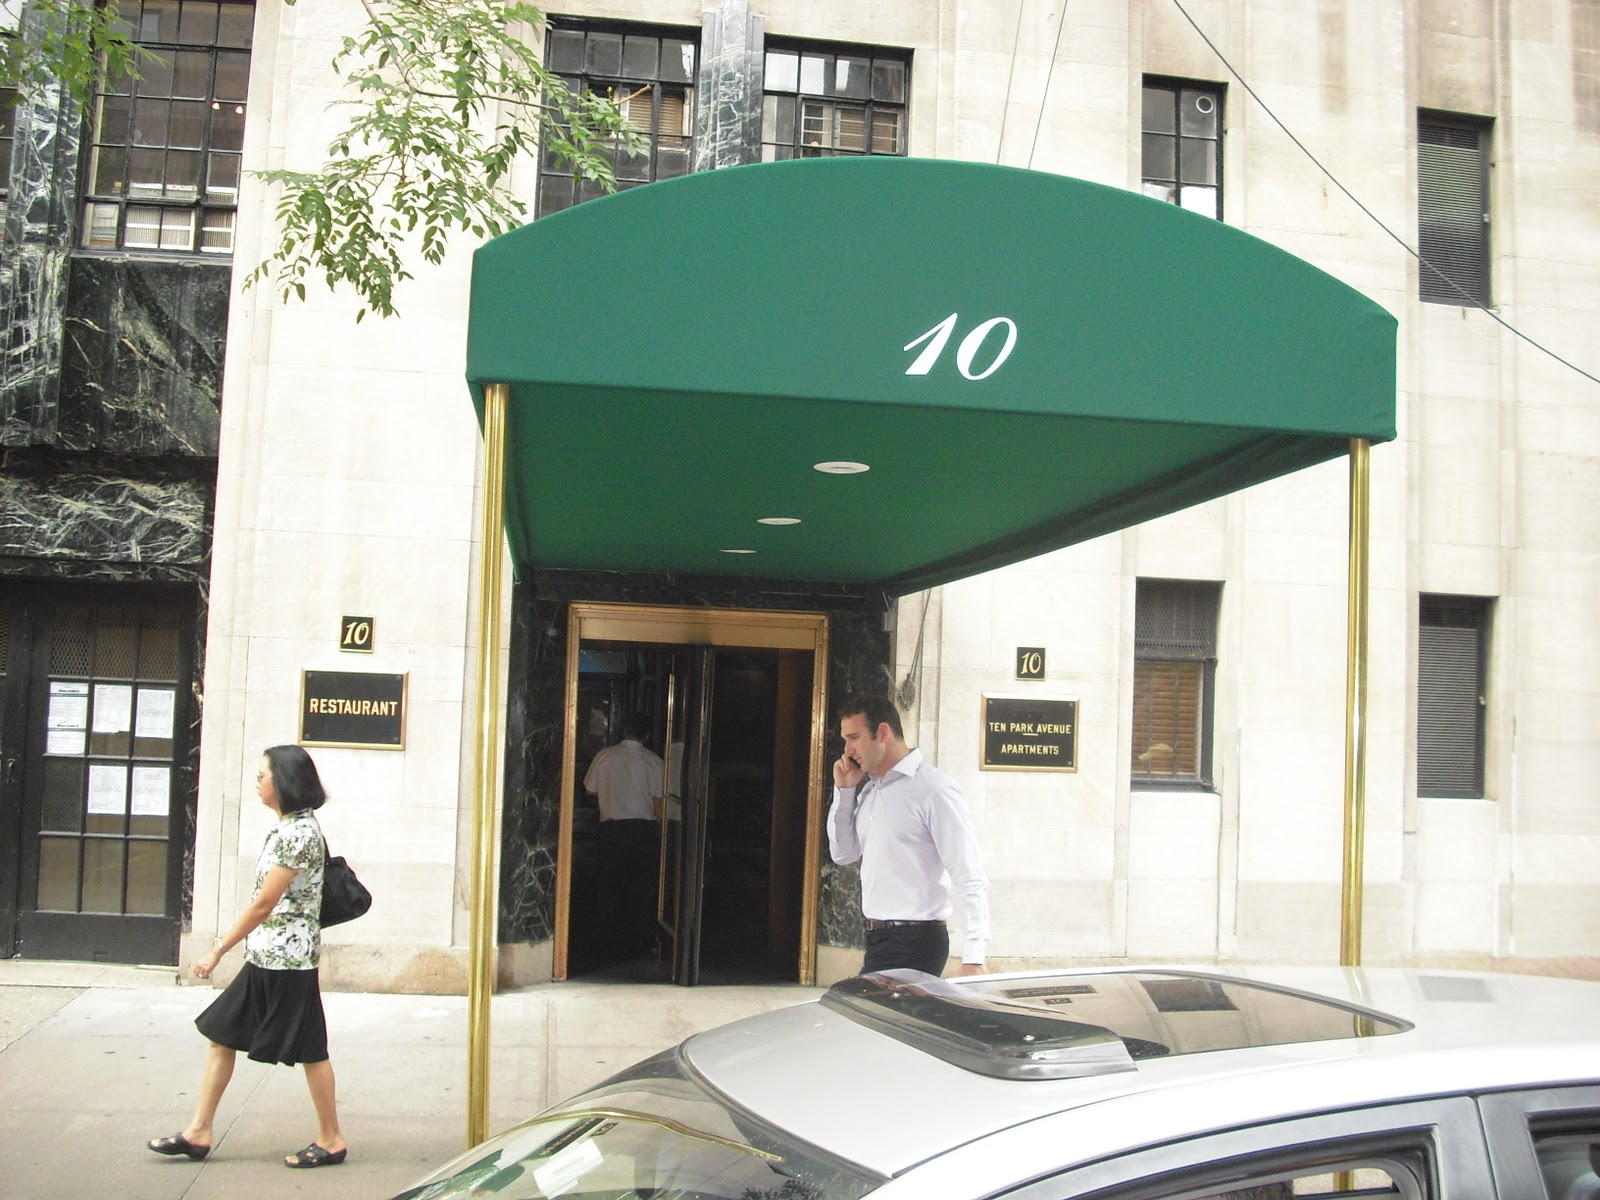 10 Park Ave NYC Glendale Awning Company